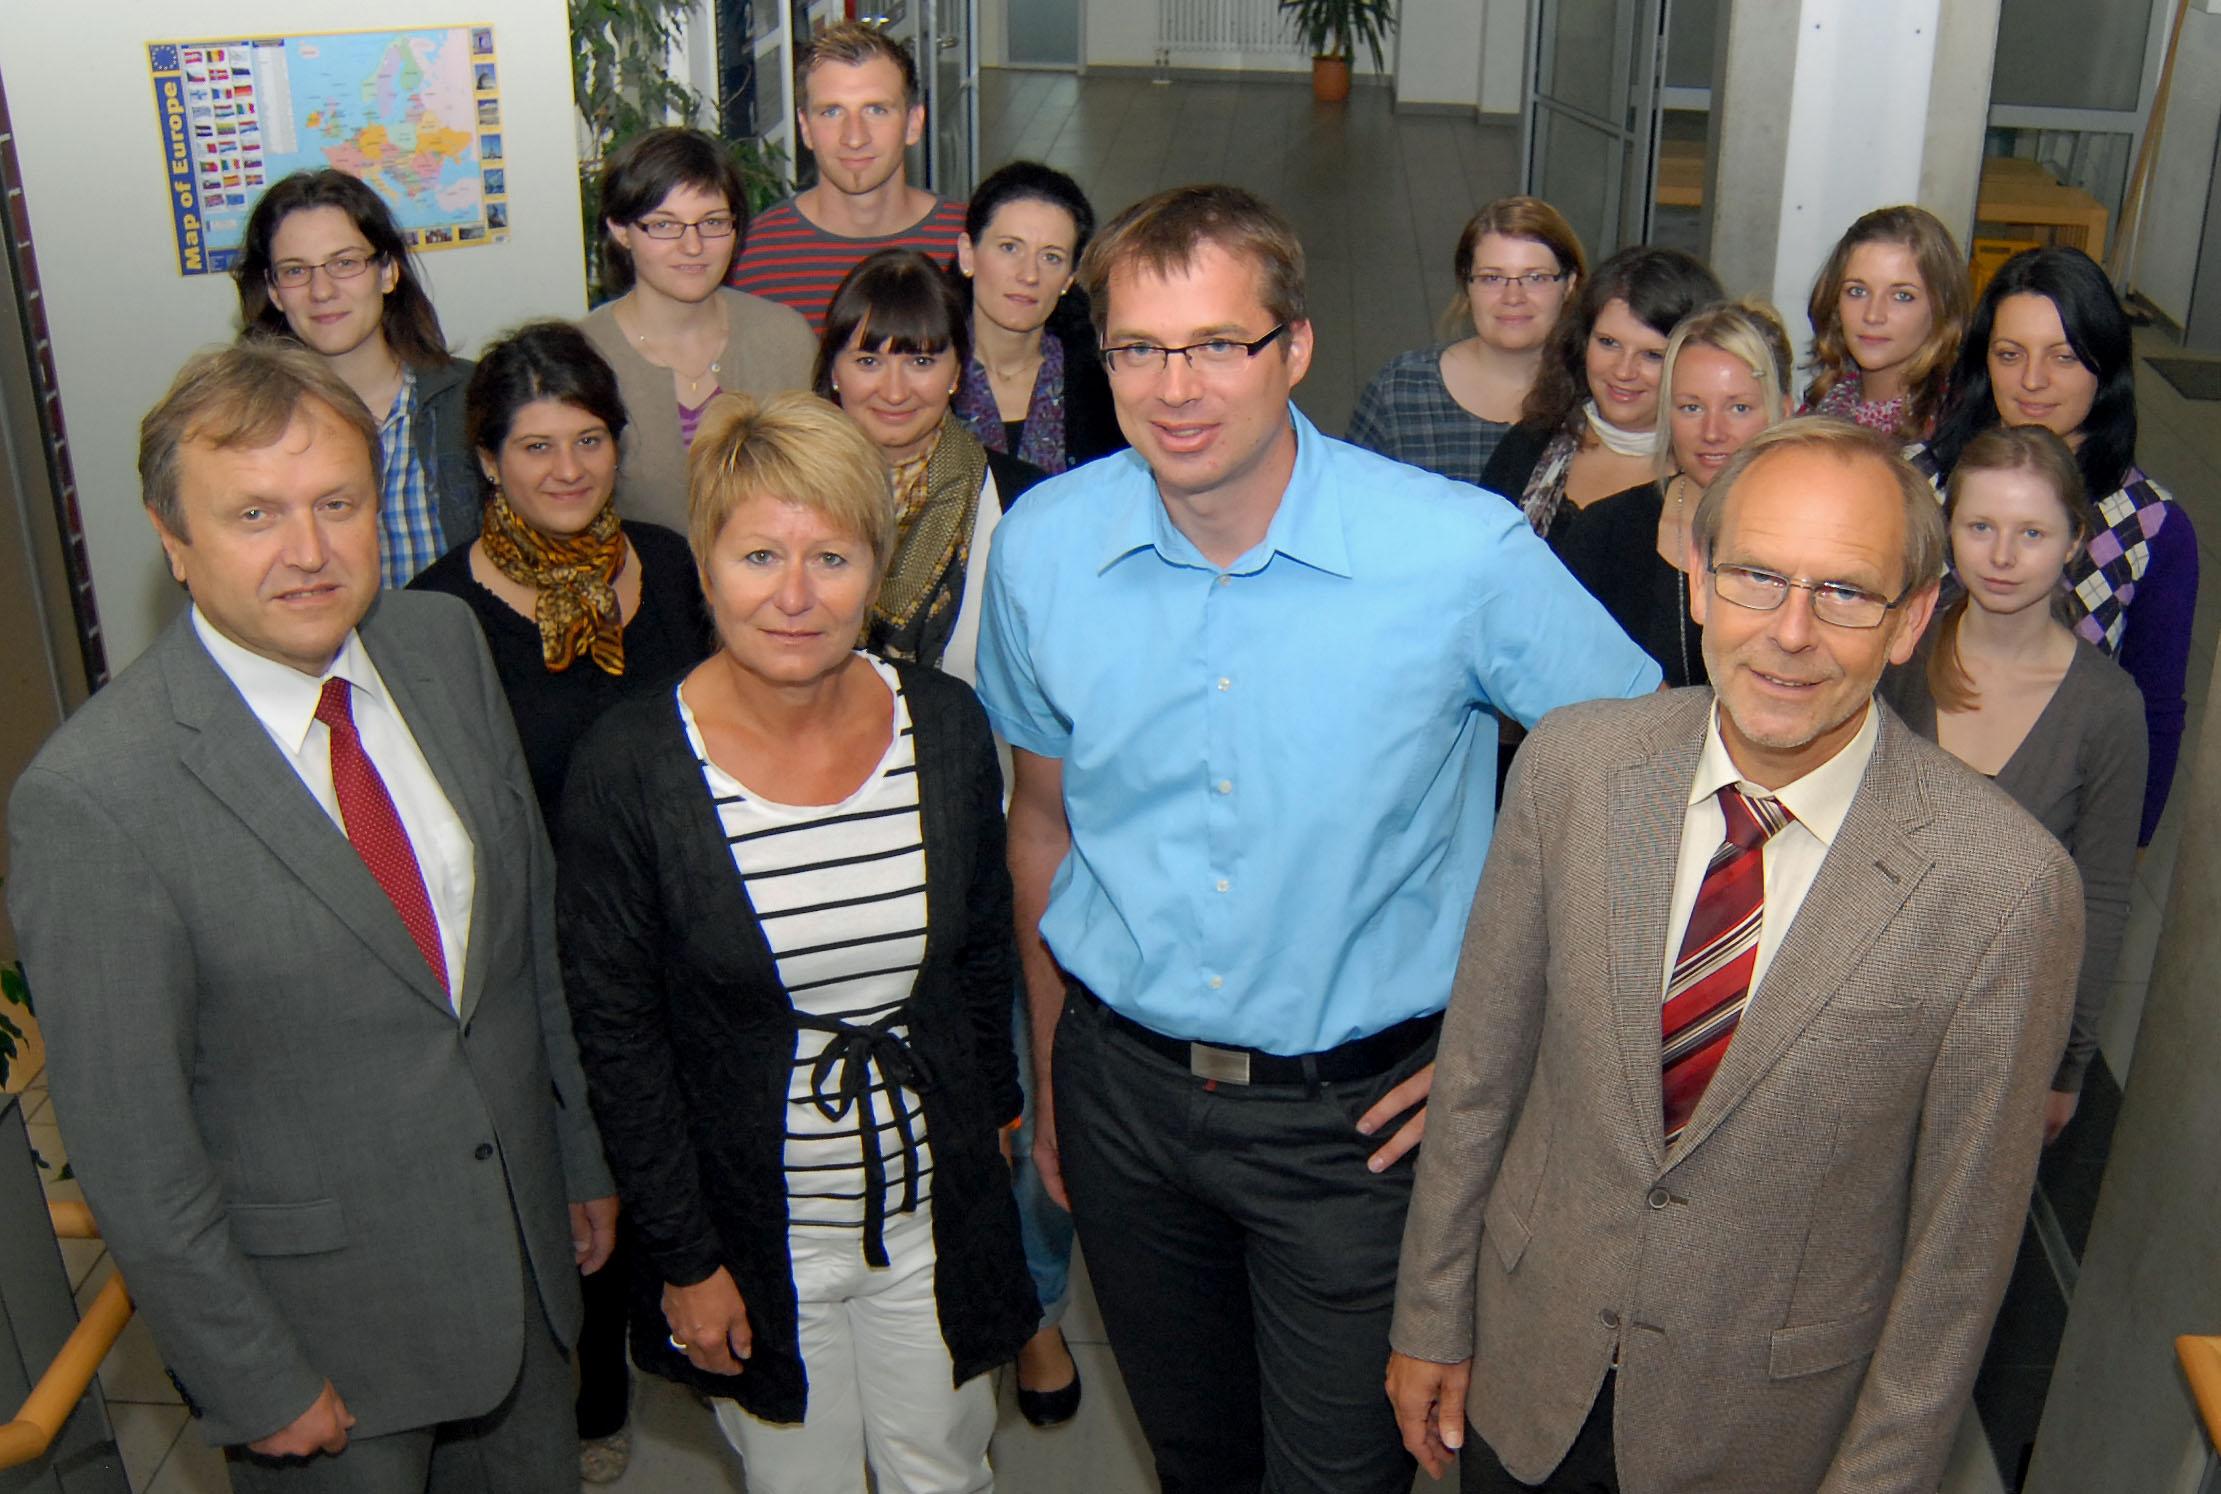 Partnersuche sulzbach-rosenberg